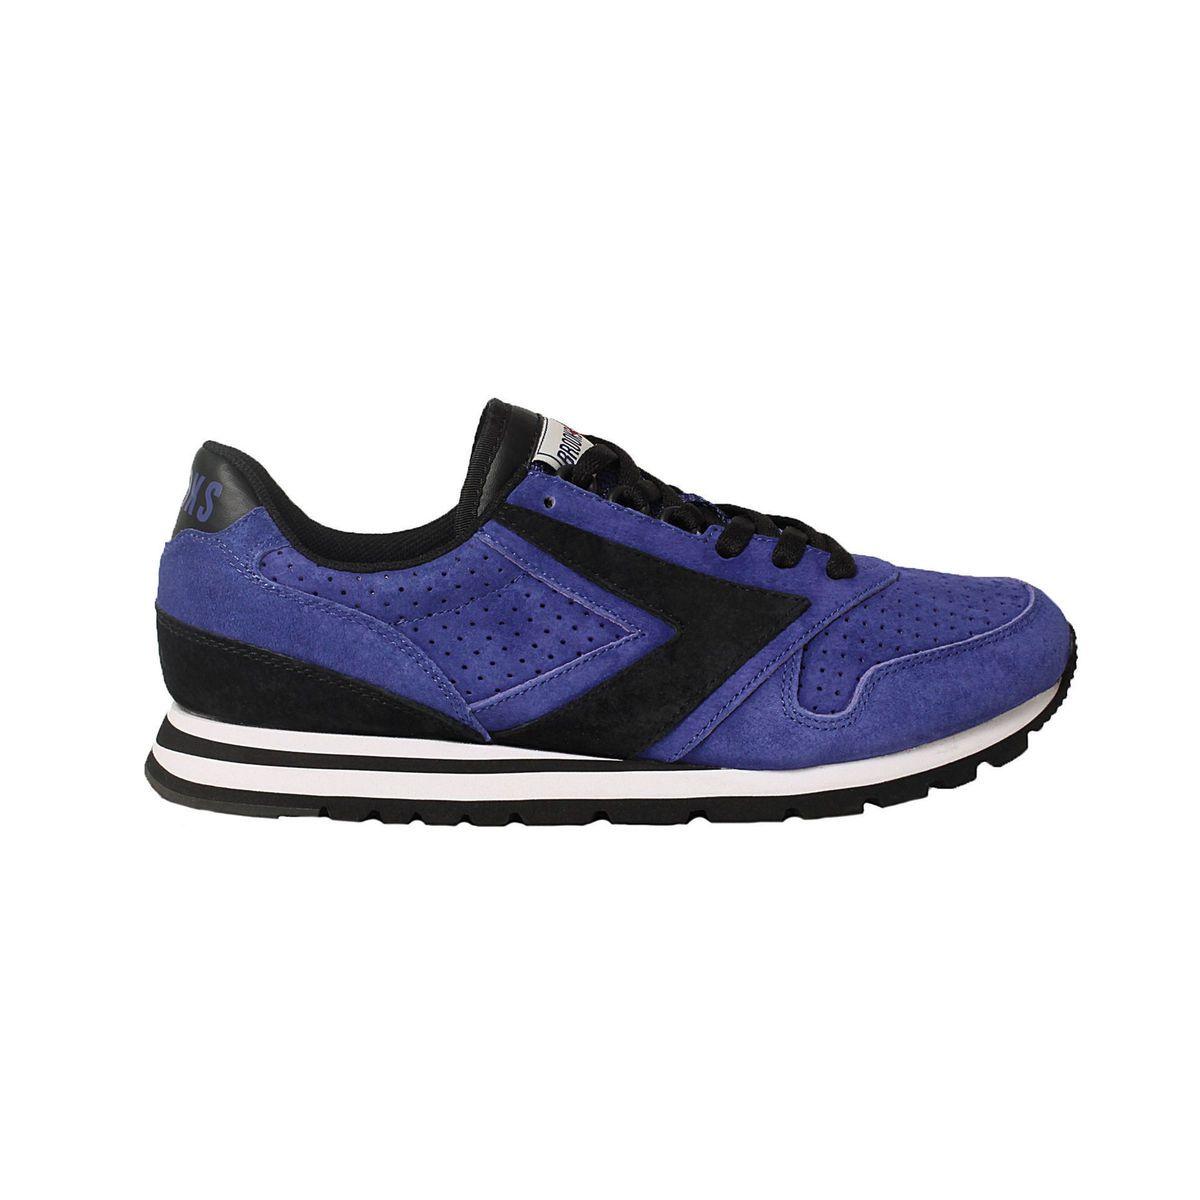 7edc4464bd5 Brooks Chariot Men s Heritage Running Shoes